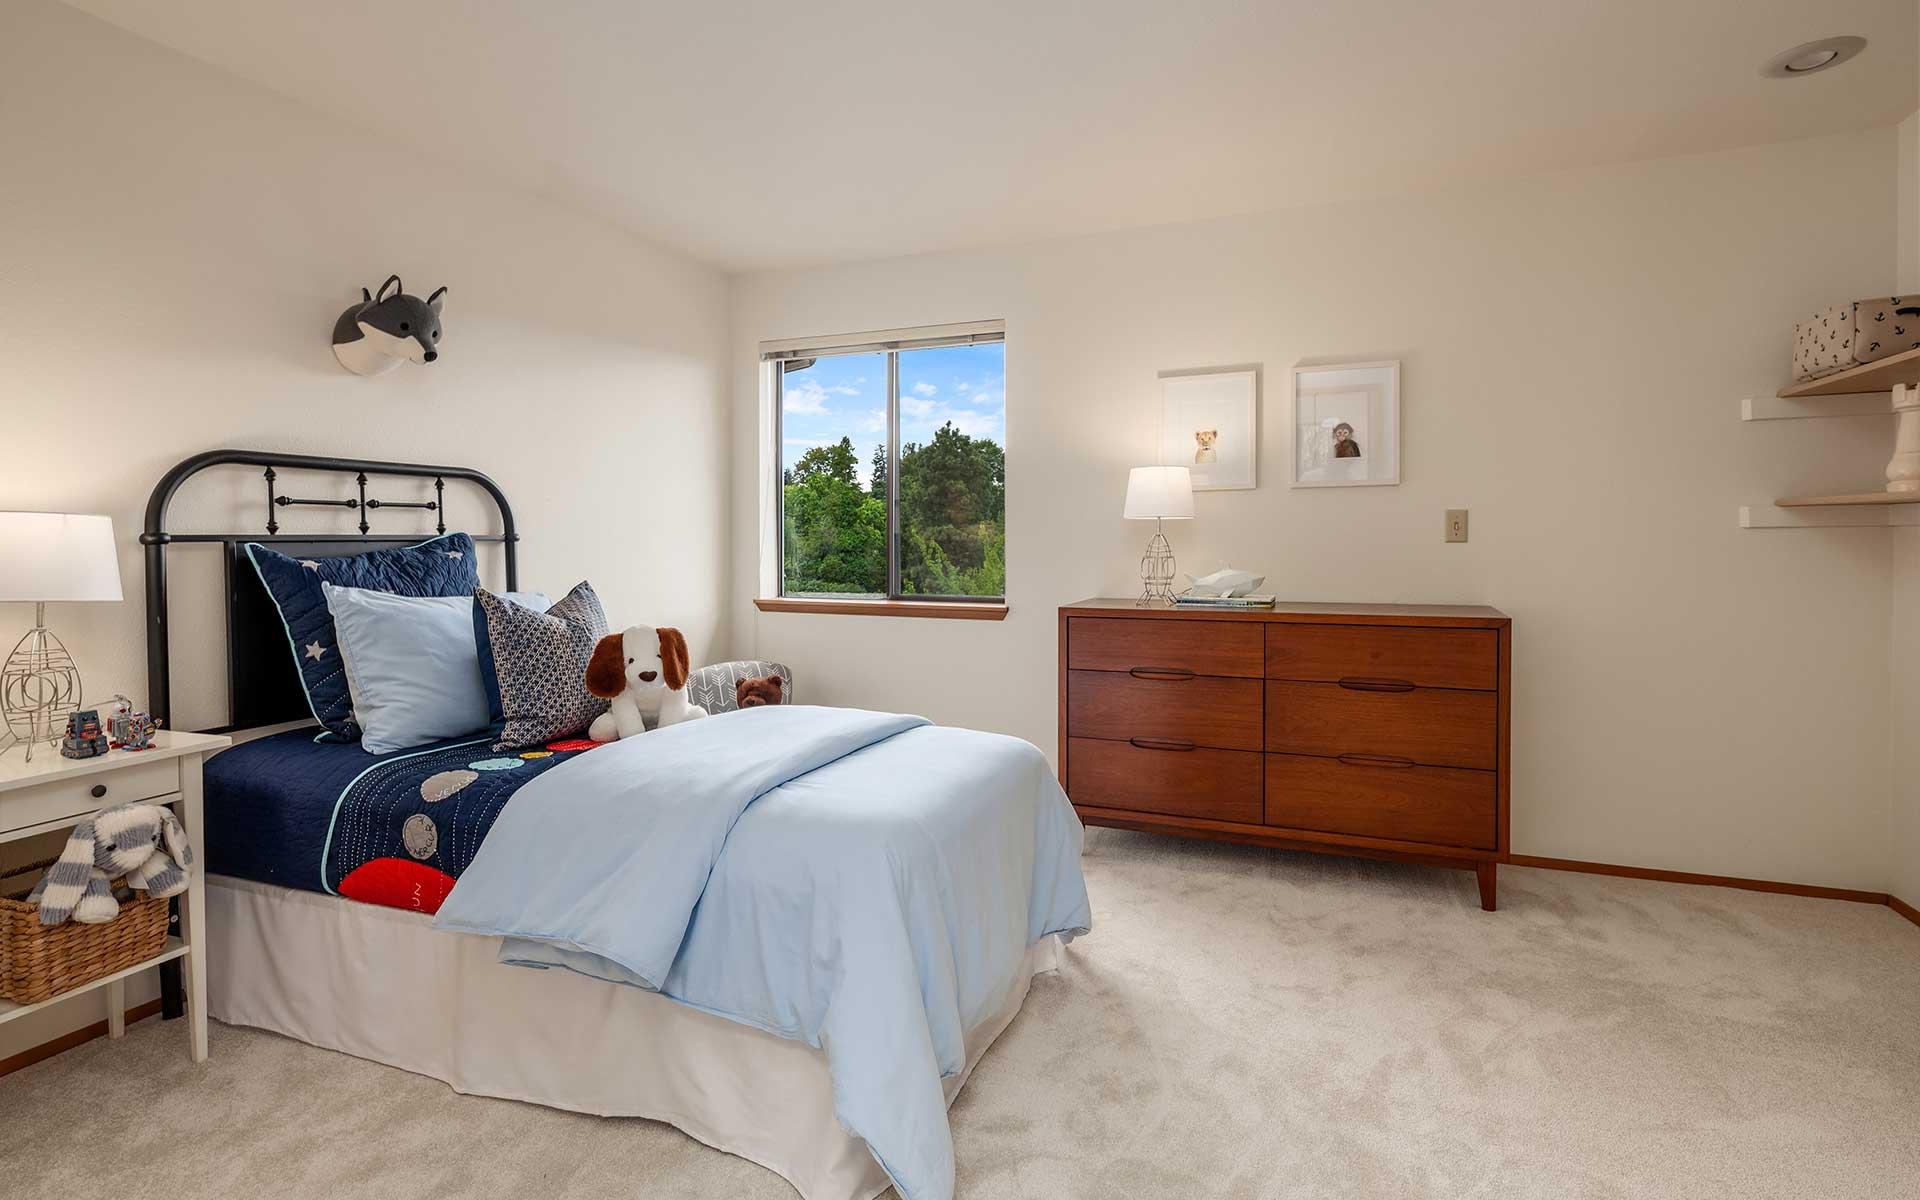 Northwest Style & Views in Lakewood photo